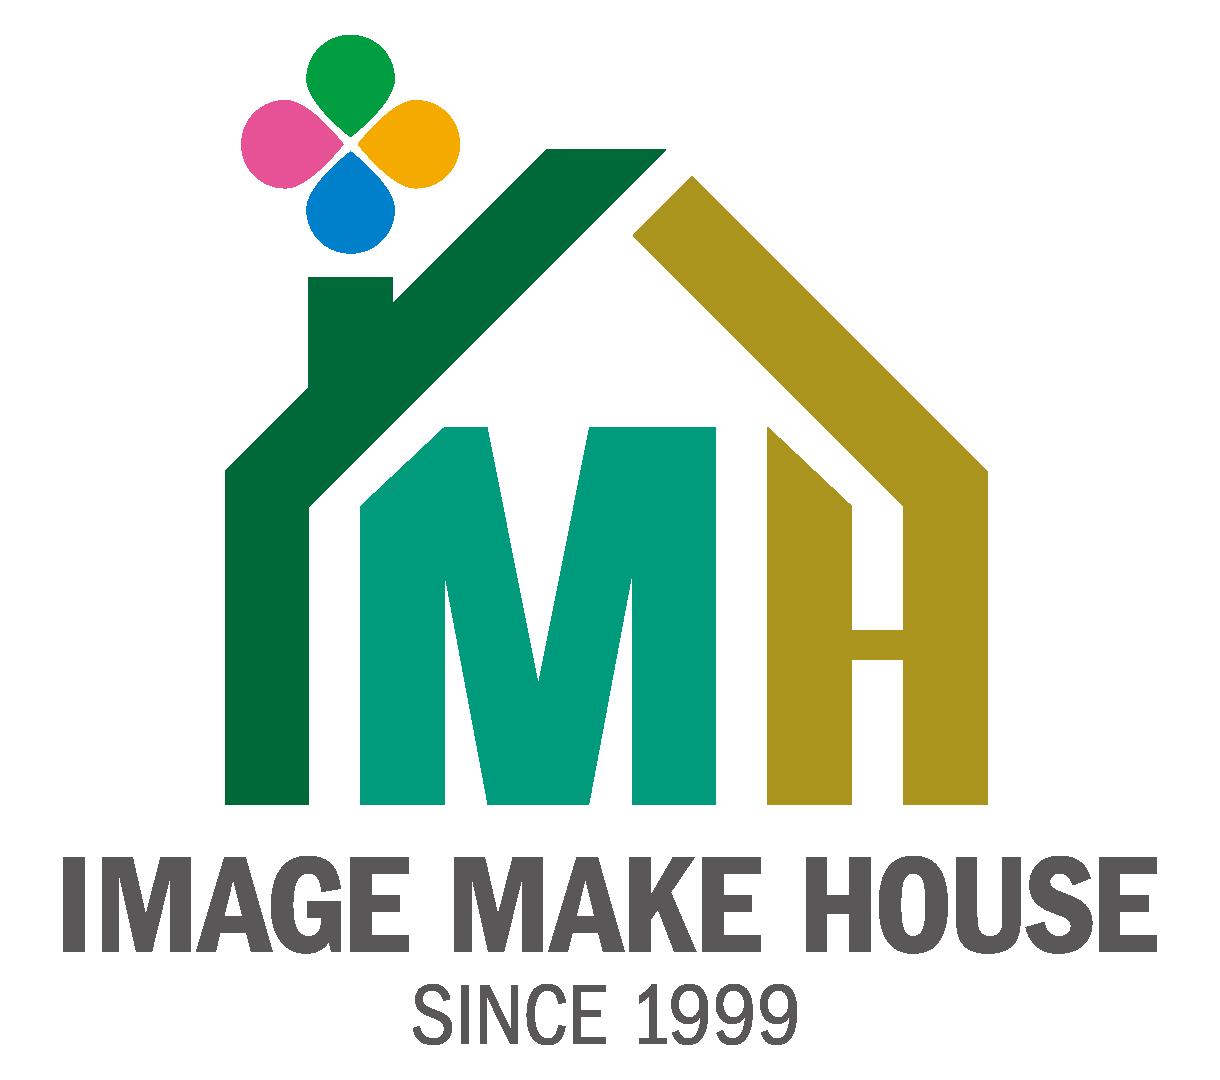 IMAGE MAKE HOUSE ロゴ